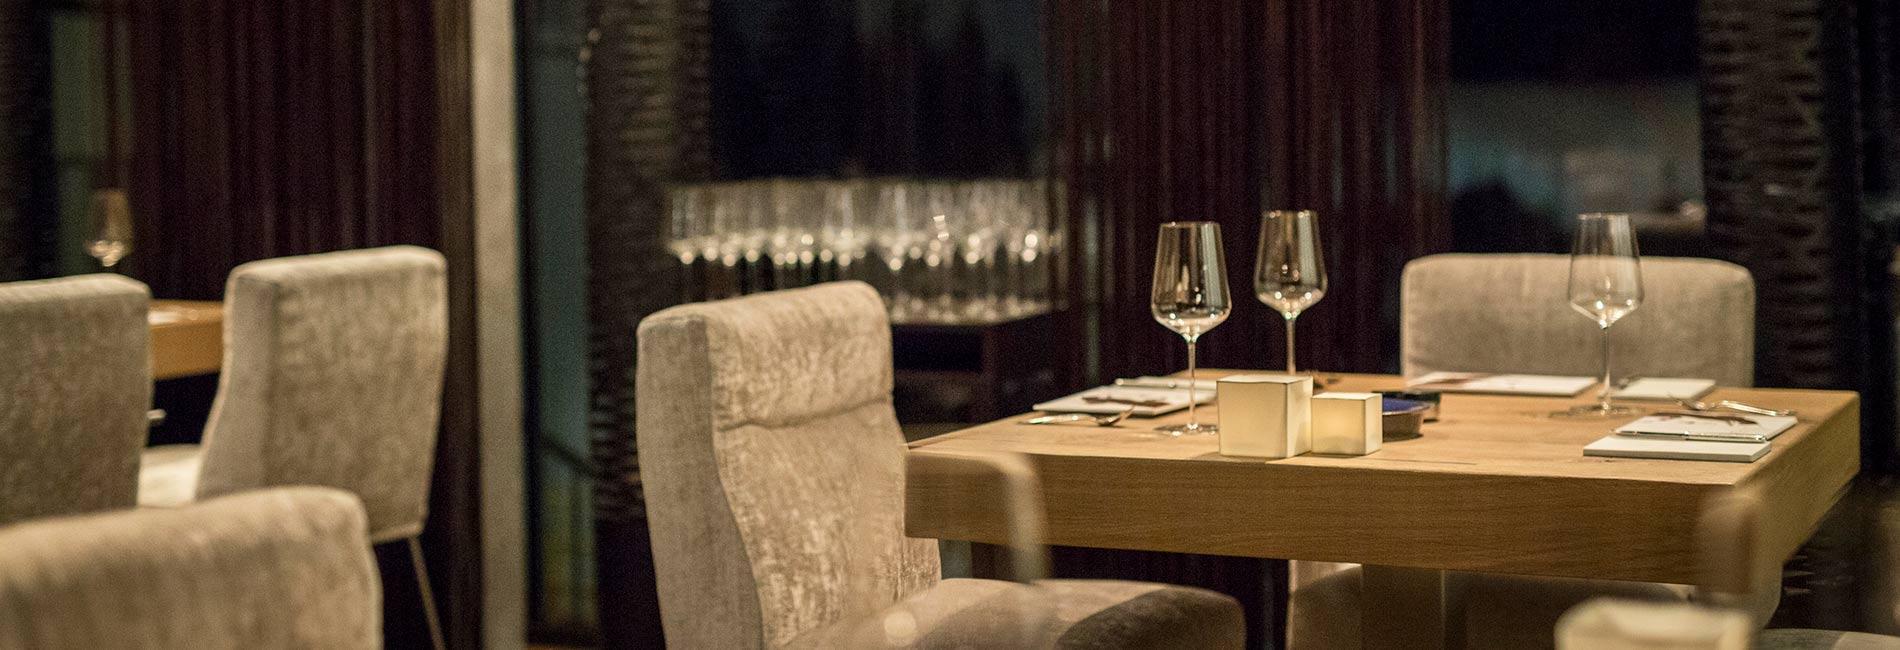 Simon Taxacher 4 Haubenrestaurant Hotel Spa Rosengarten Kirchberg